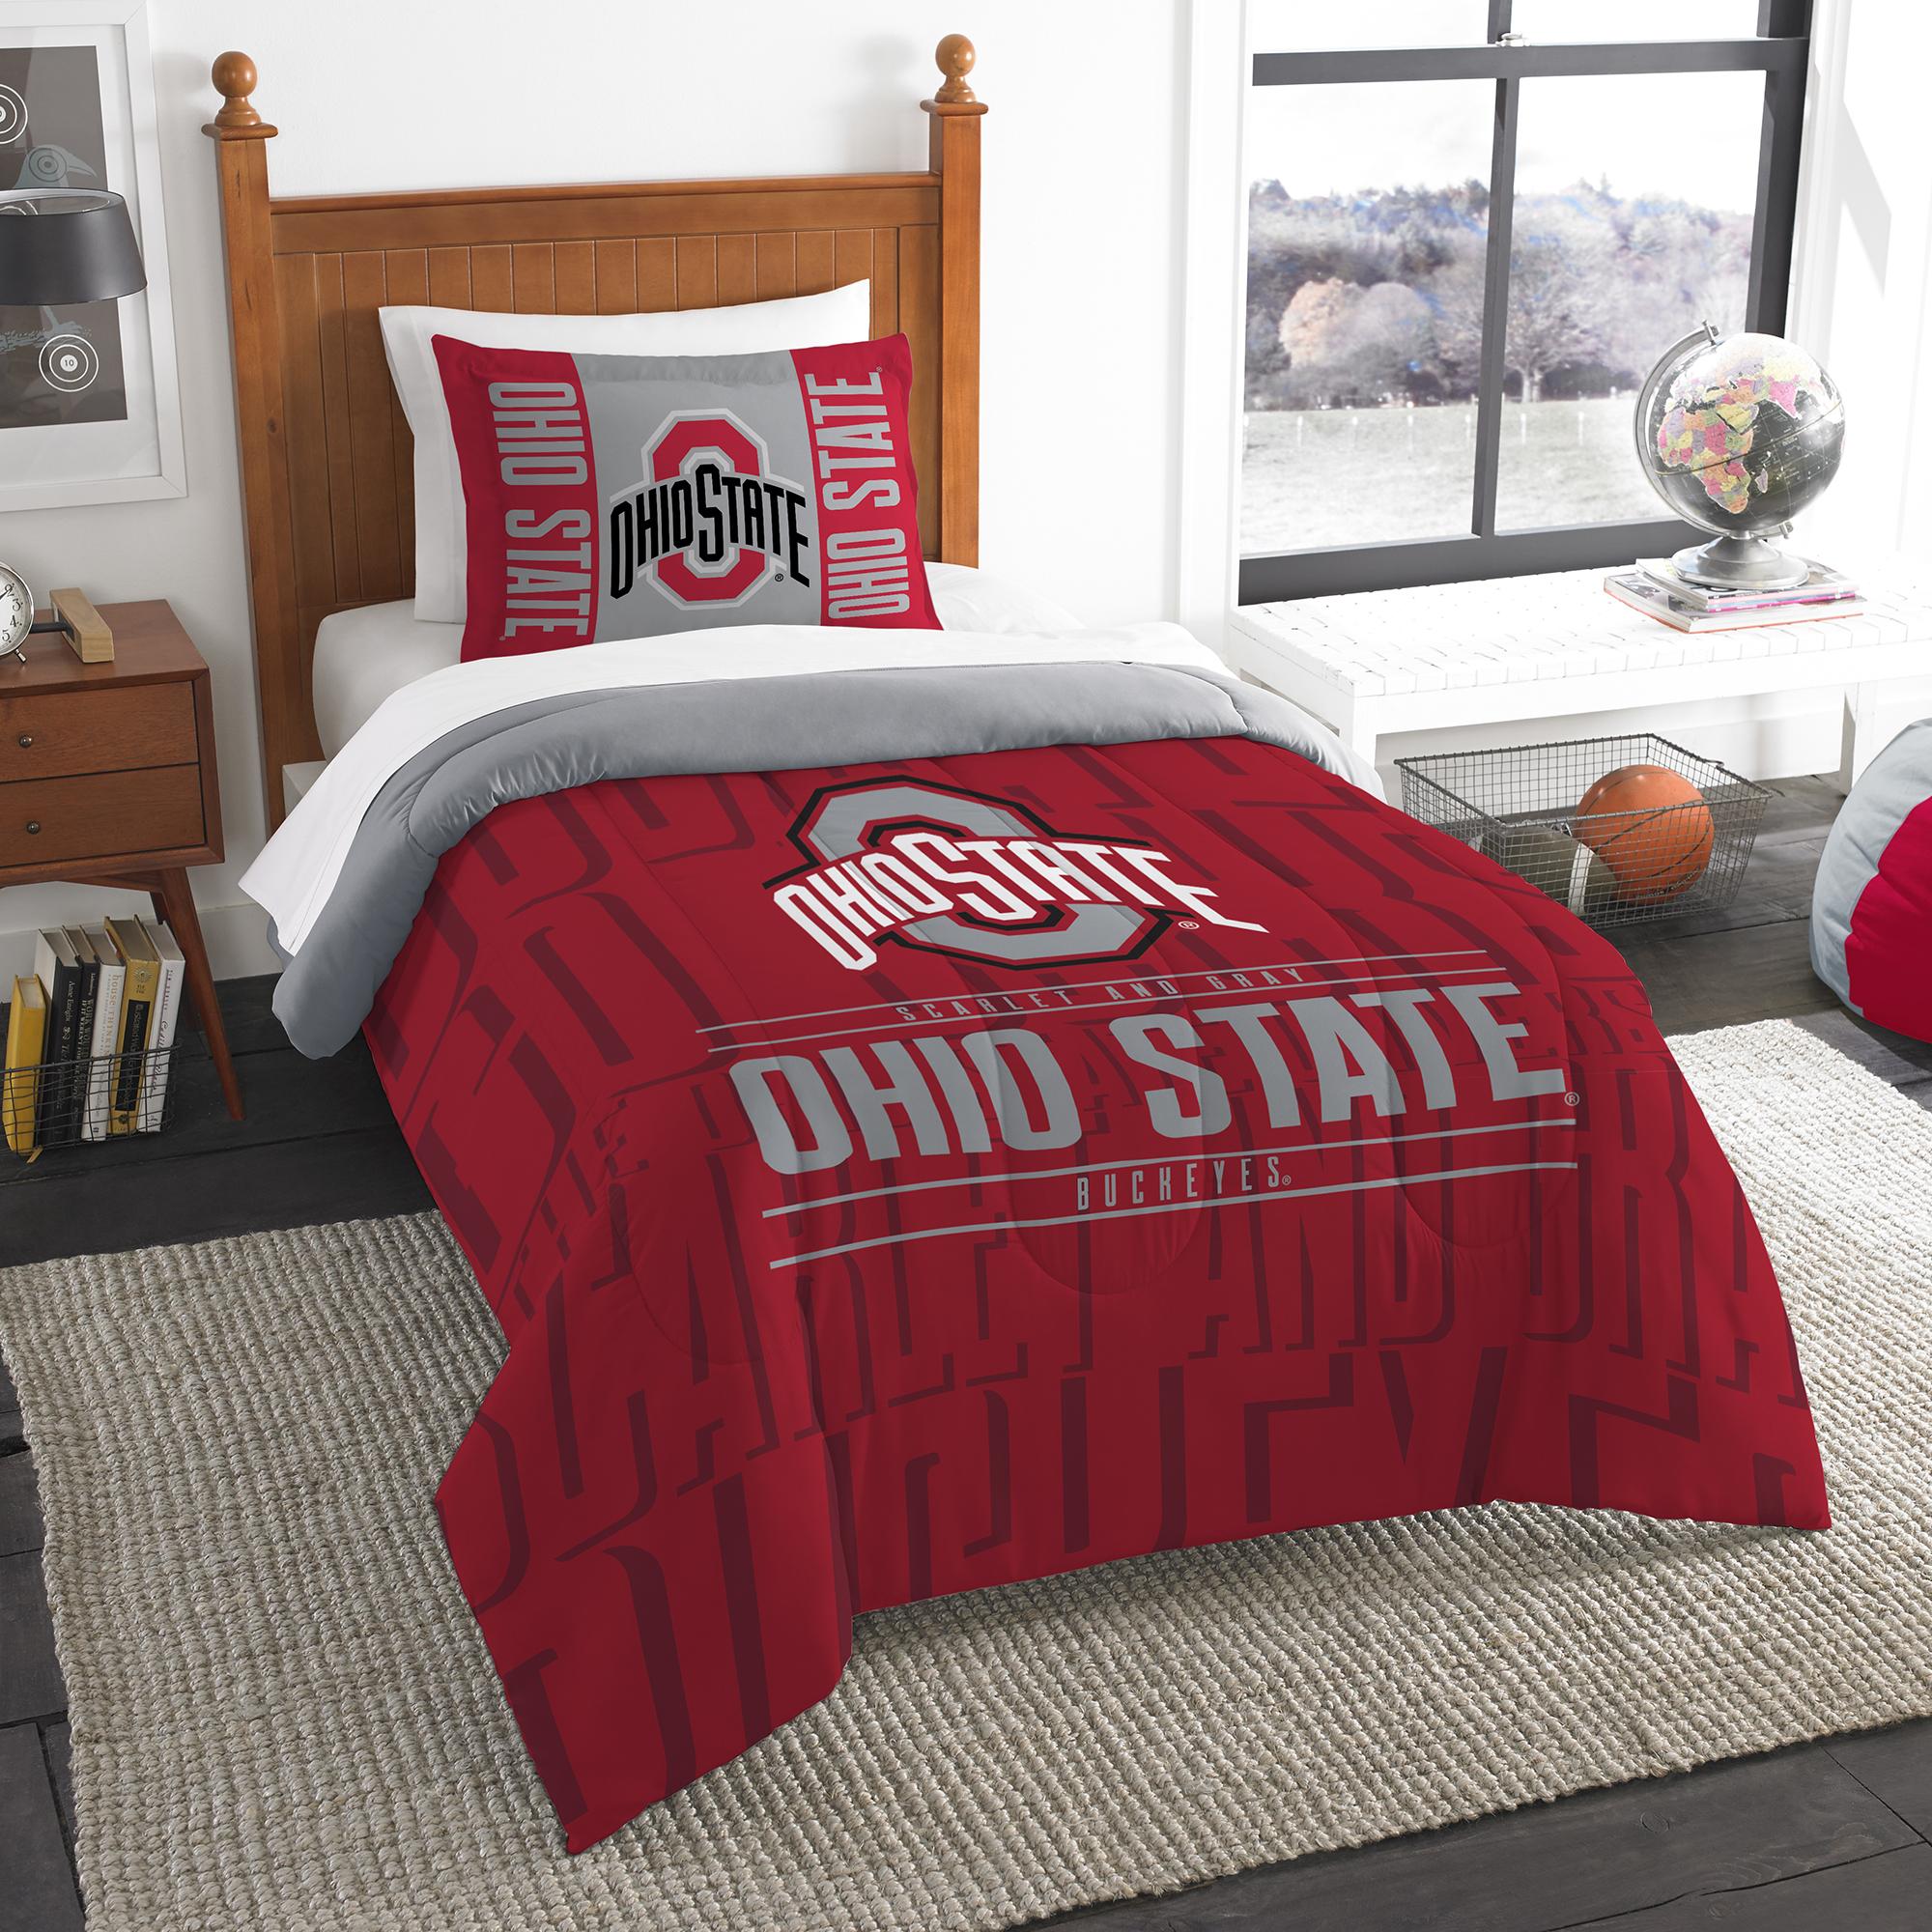 Homemade Wax Melts Ohio State Buckeyes Full Comforter /& Sheet Set 5 Piece NCAA Bedding